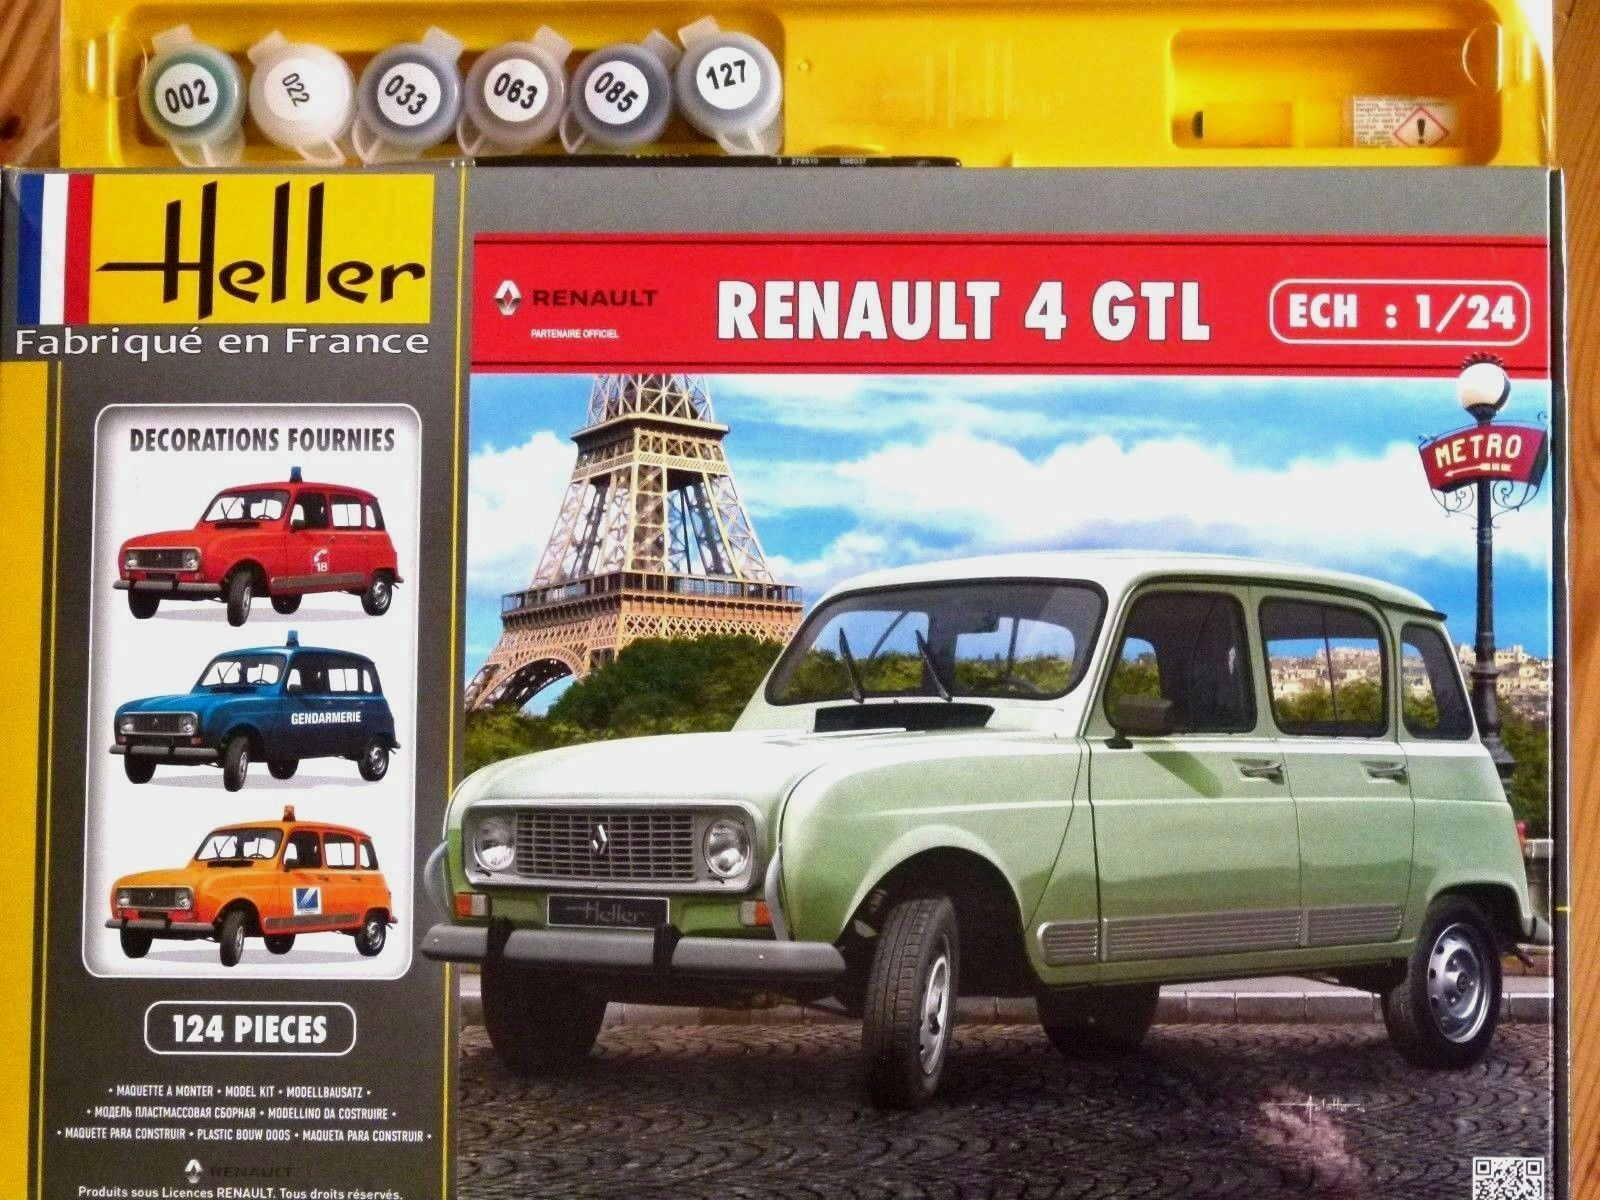 Heller 1 24 Renault 4 GTL Car Gift Set Model Kit